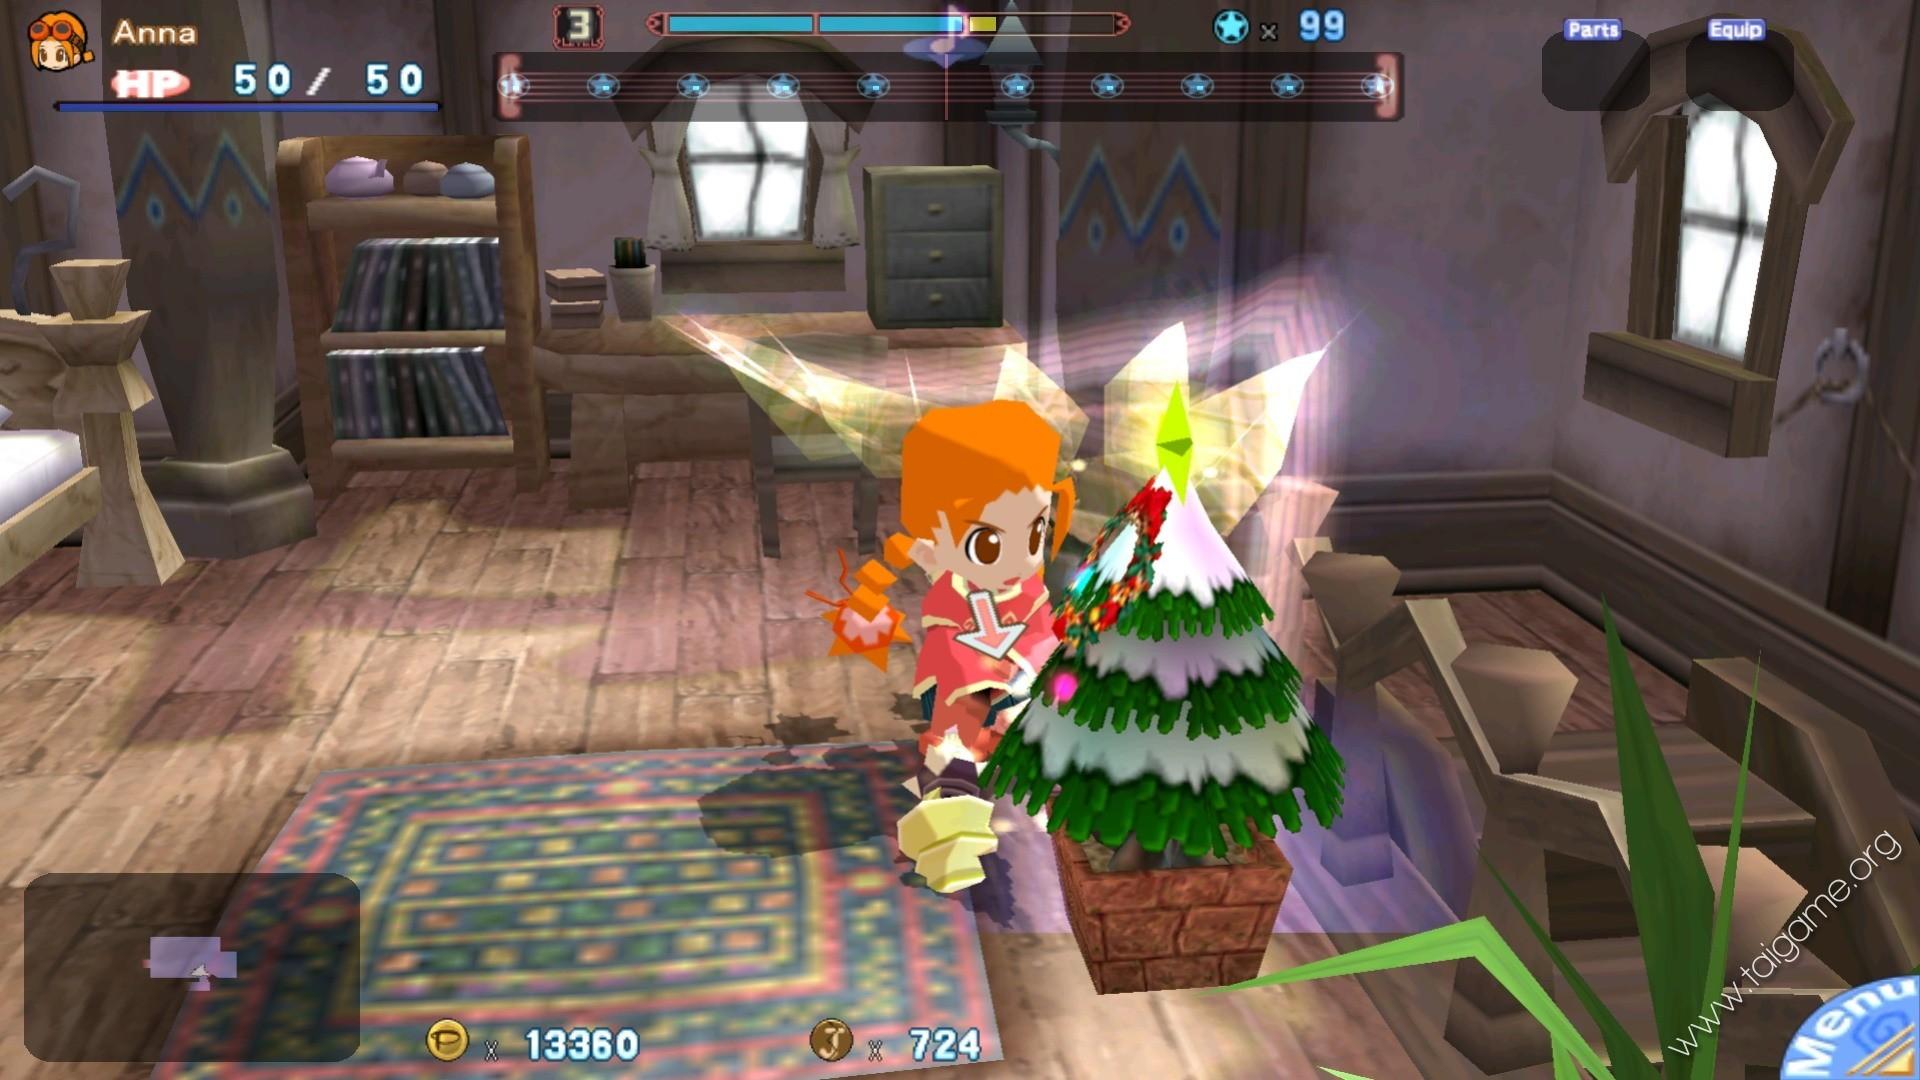 [PSP] Game Gurumin - A Monstrous Adventure